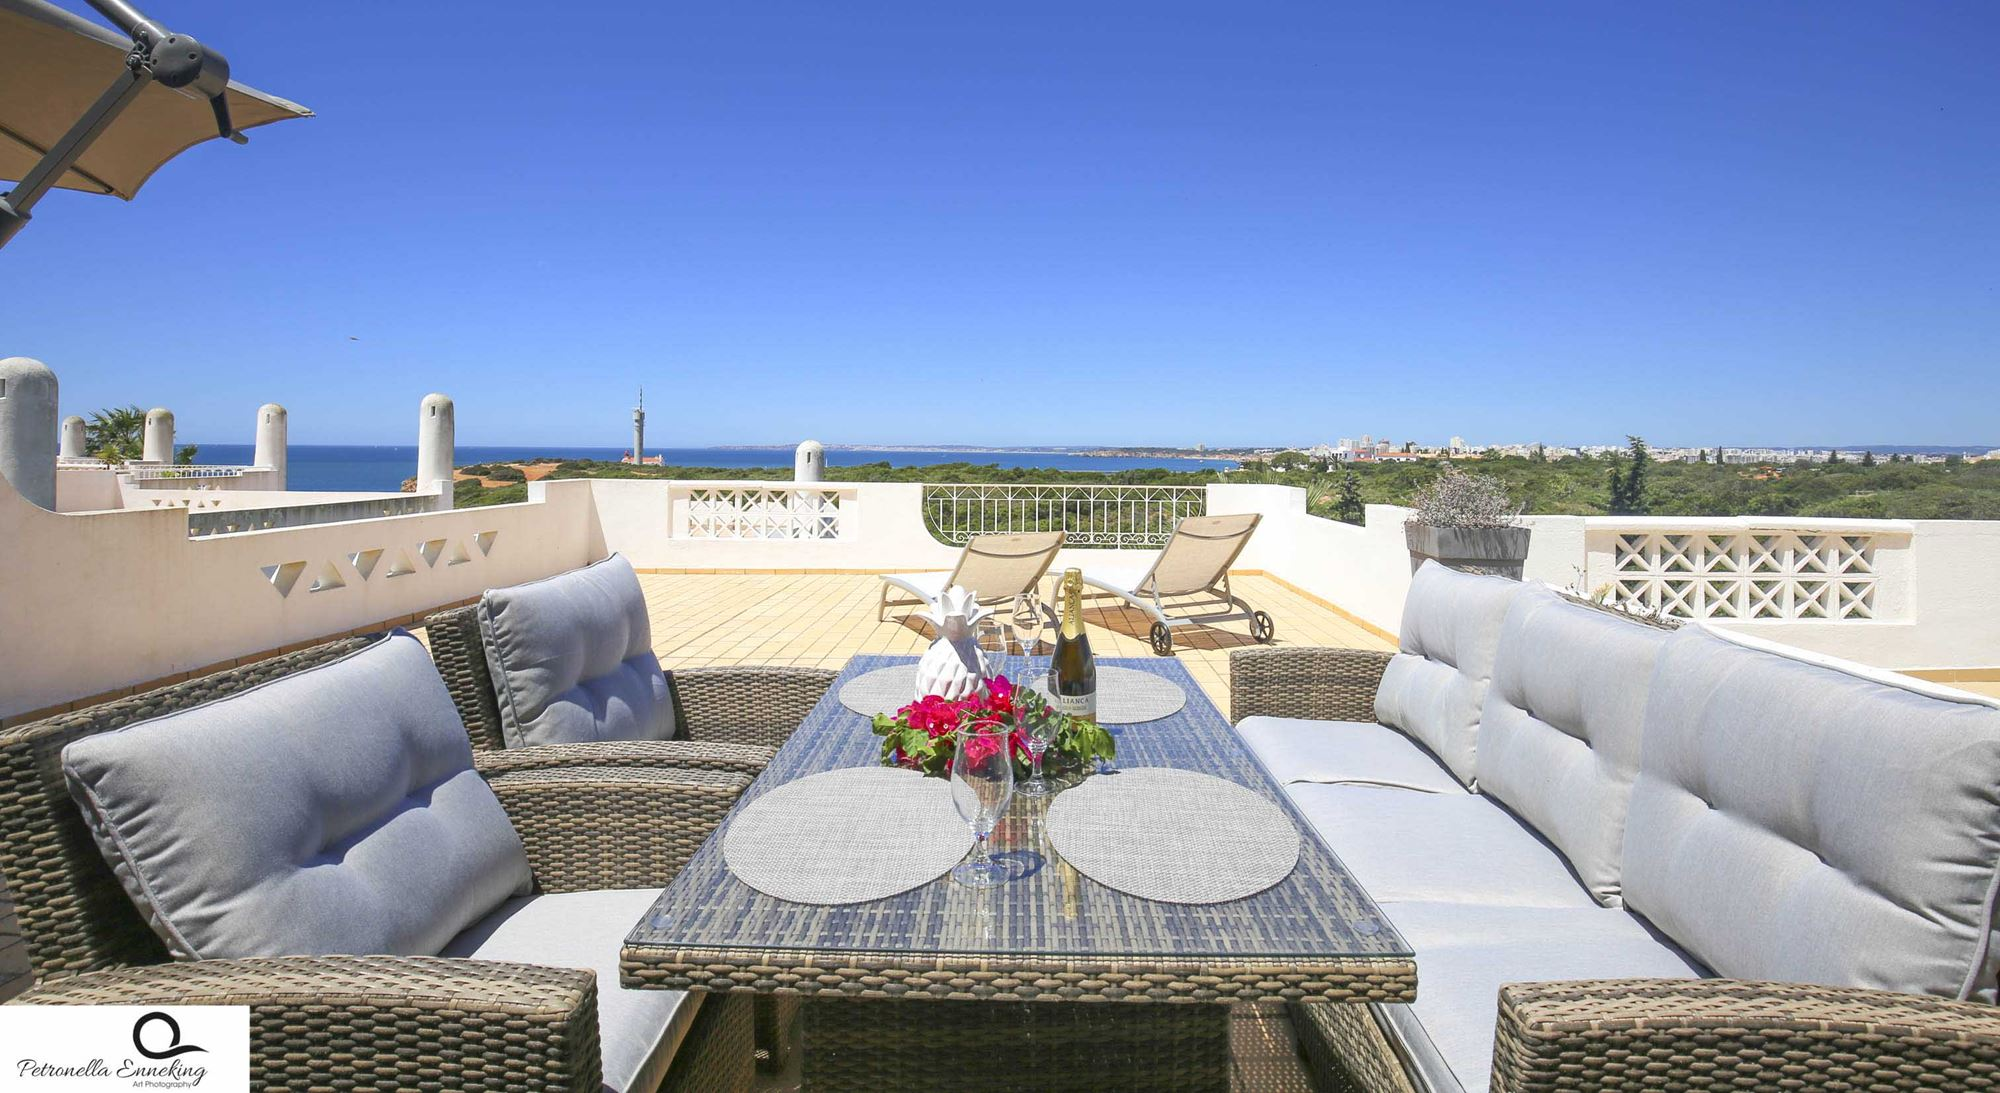 Vila Gaivotta T1 Sea view Algarve-Balcony- Enneking Premium Rentals